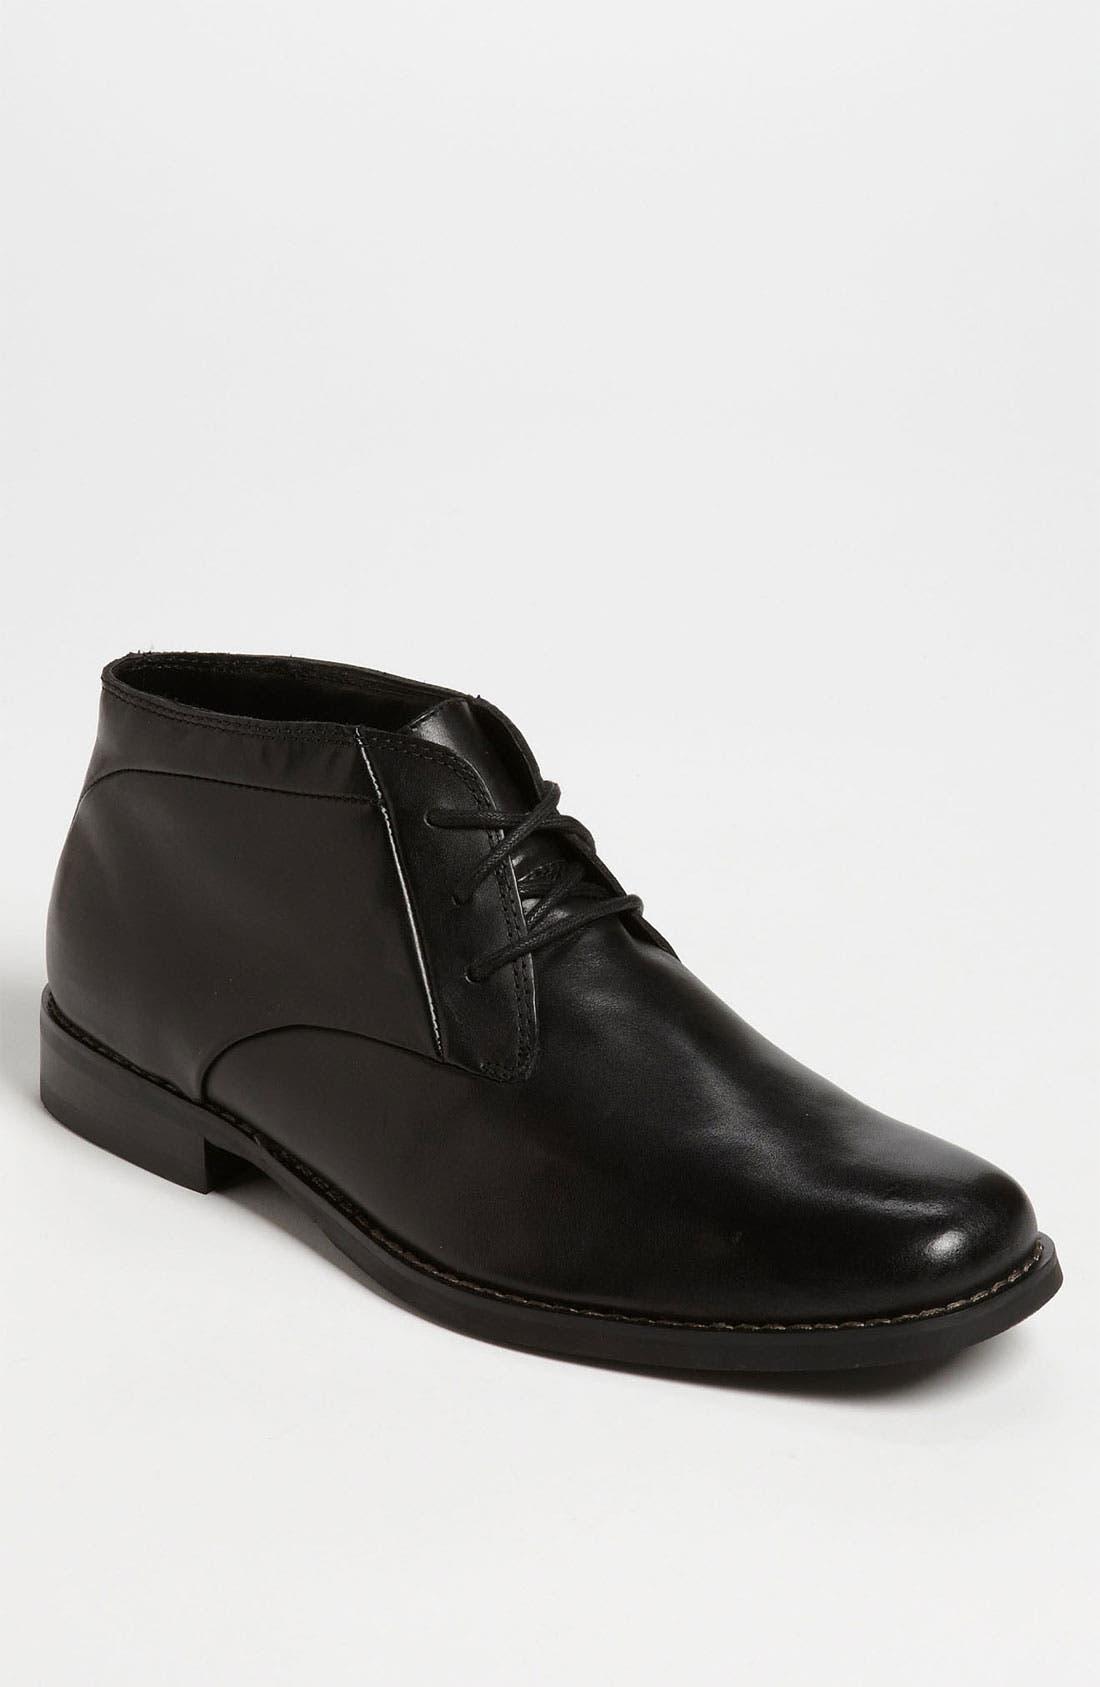 Alternate Image 1 Selected - Calvin Klein 'Smith' Chukka Boot (Online Exclusive)